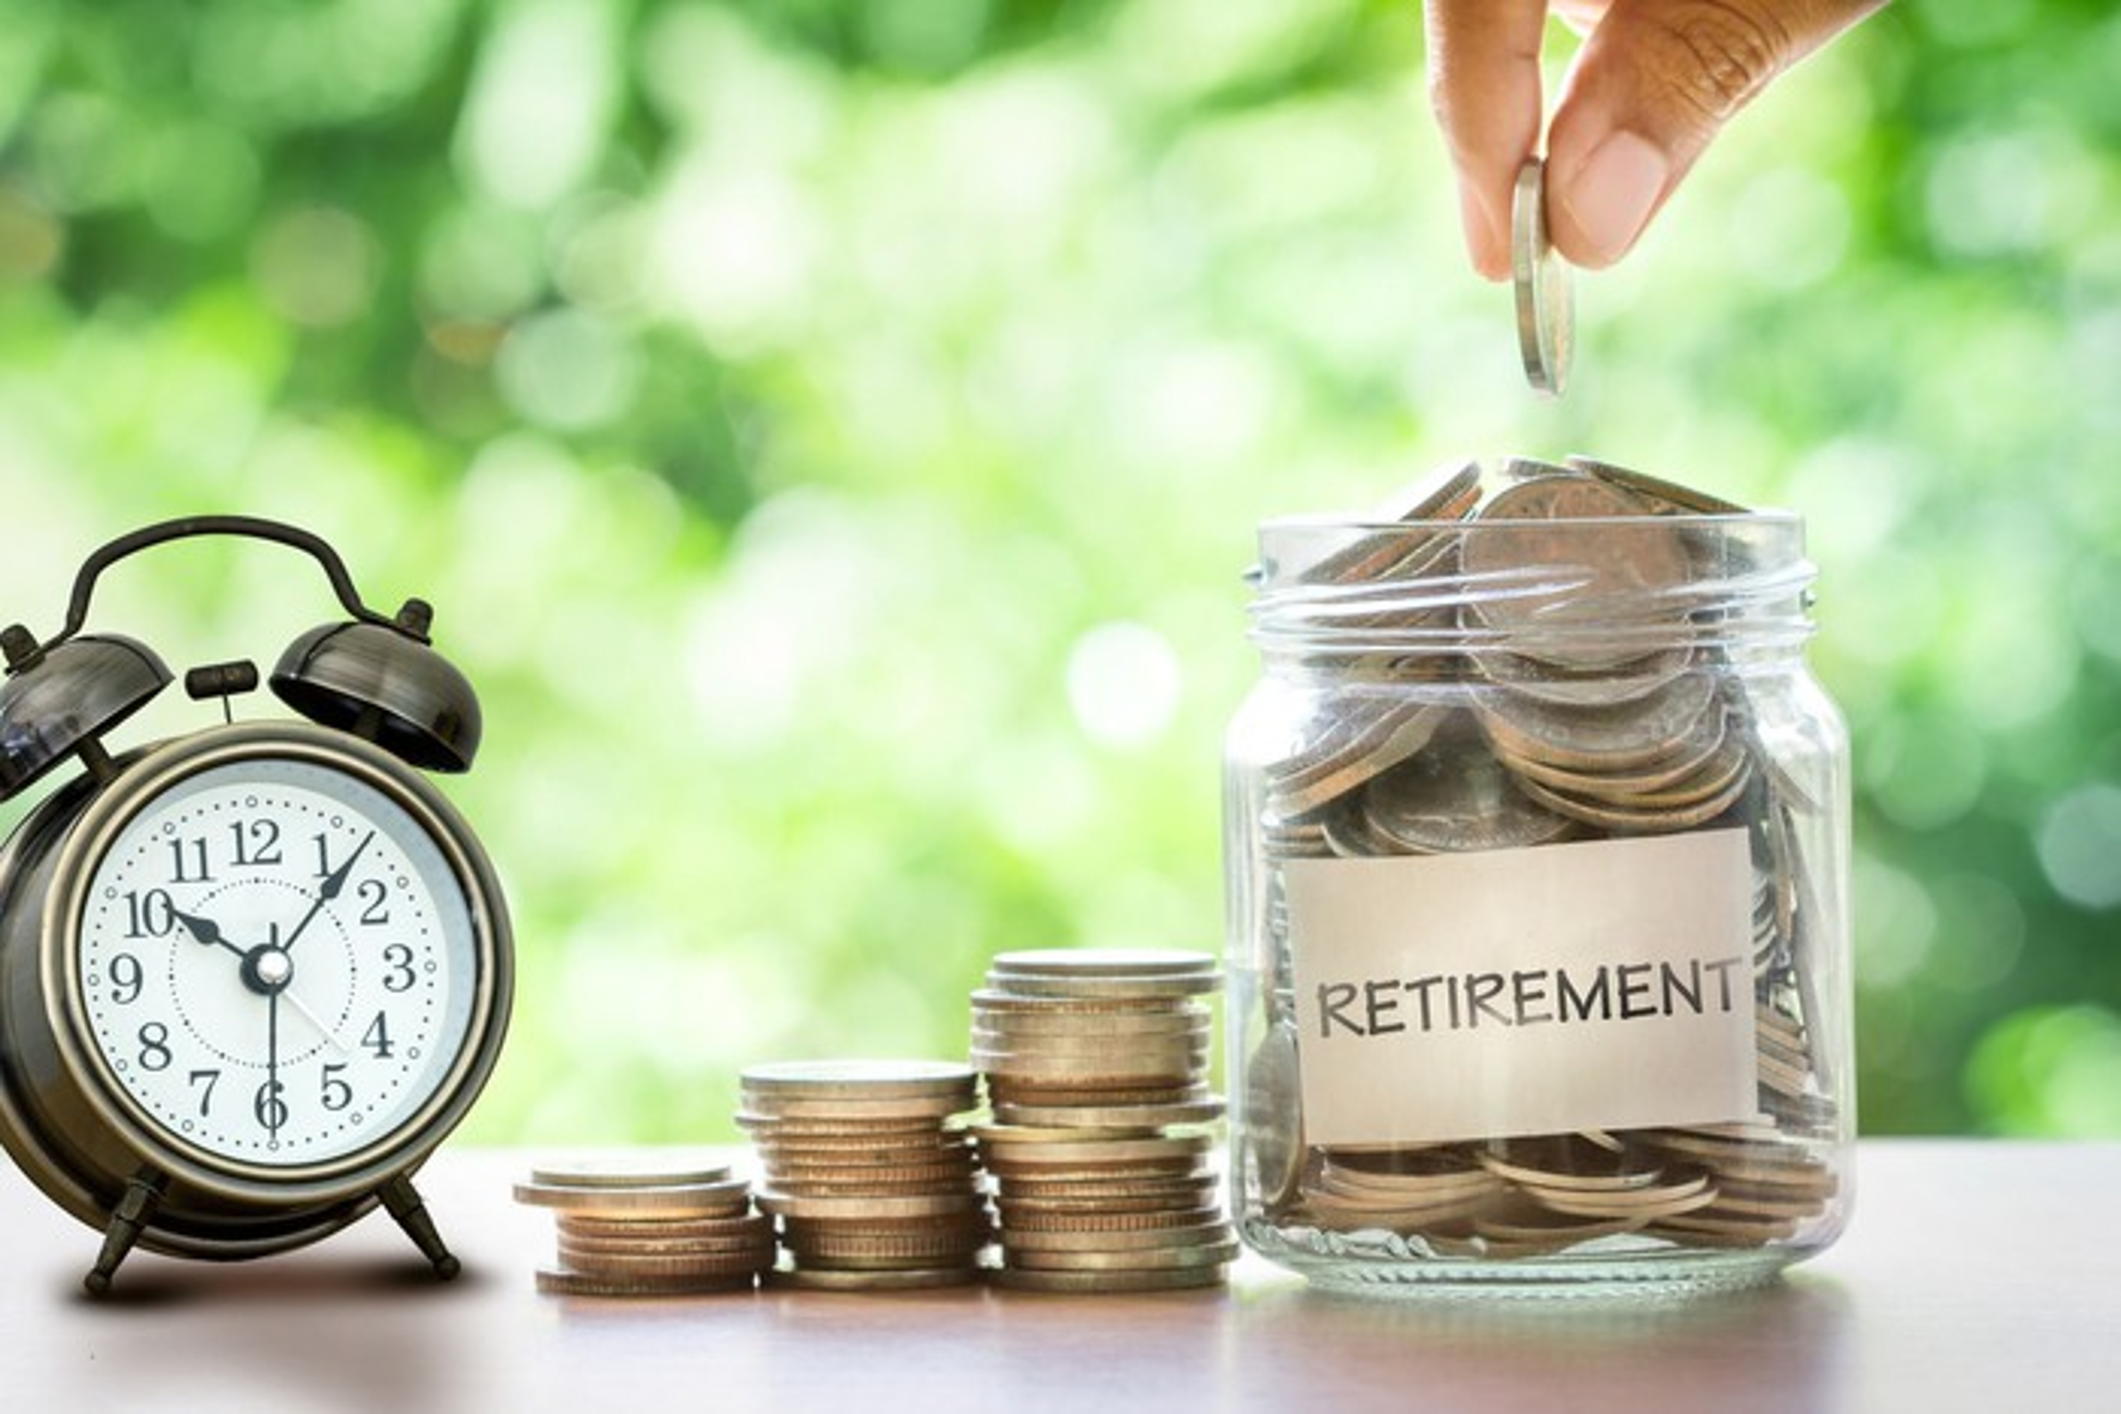 Jar full of retirement savings next to a clock.